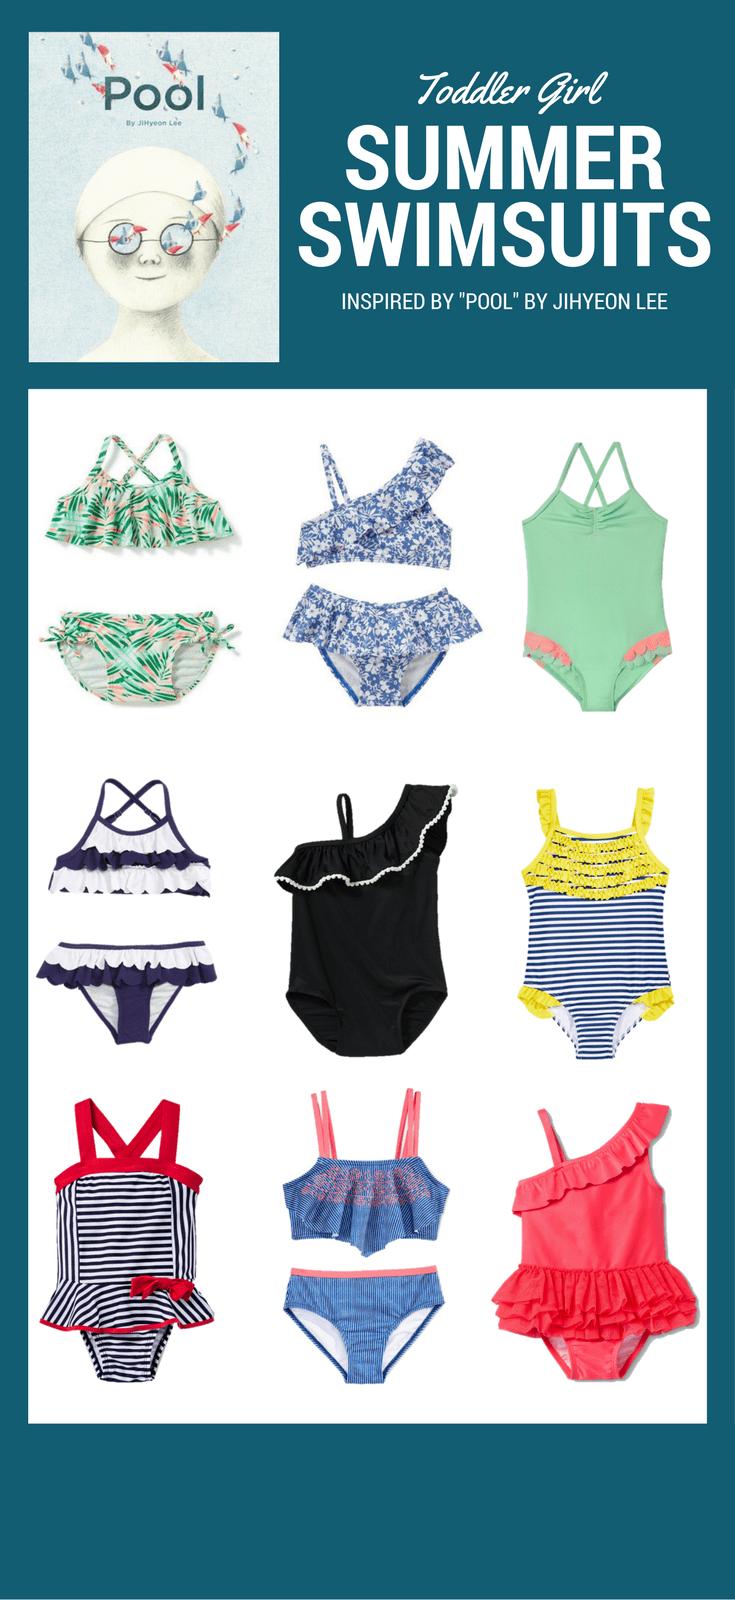 Favorite Toddler Girls Swimsuits for Summer 2017